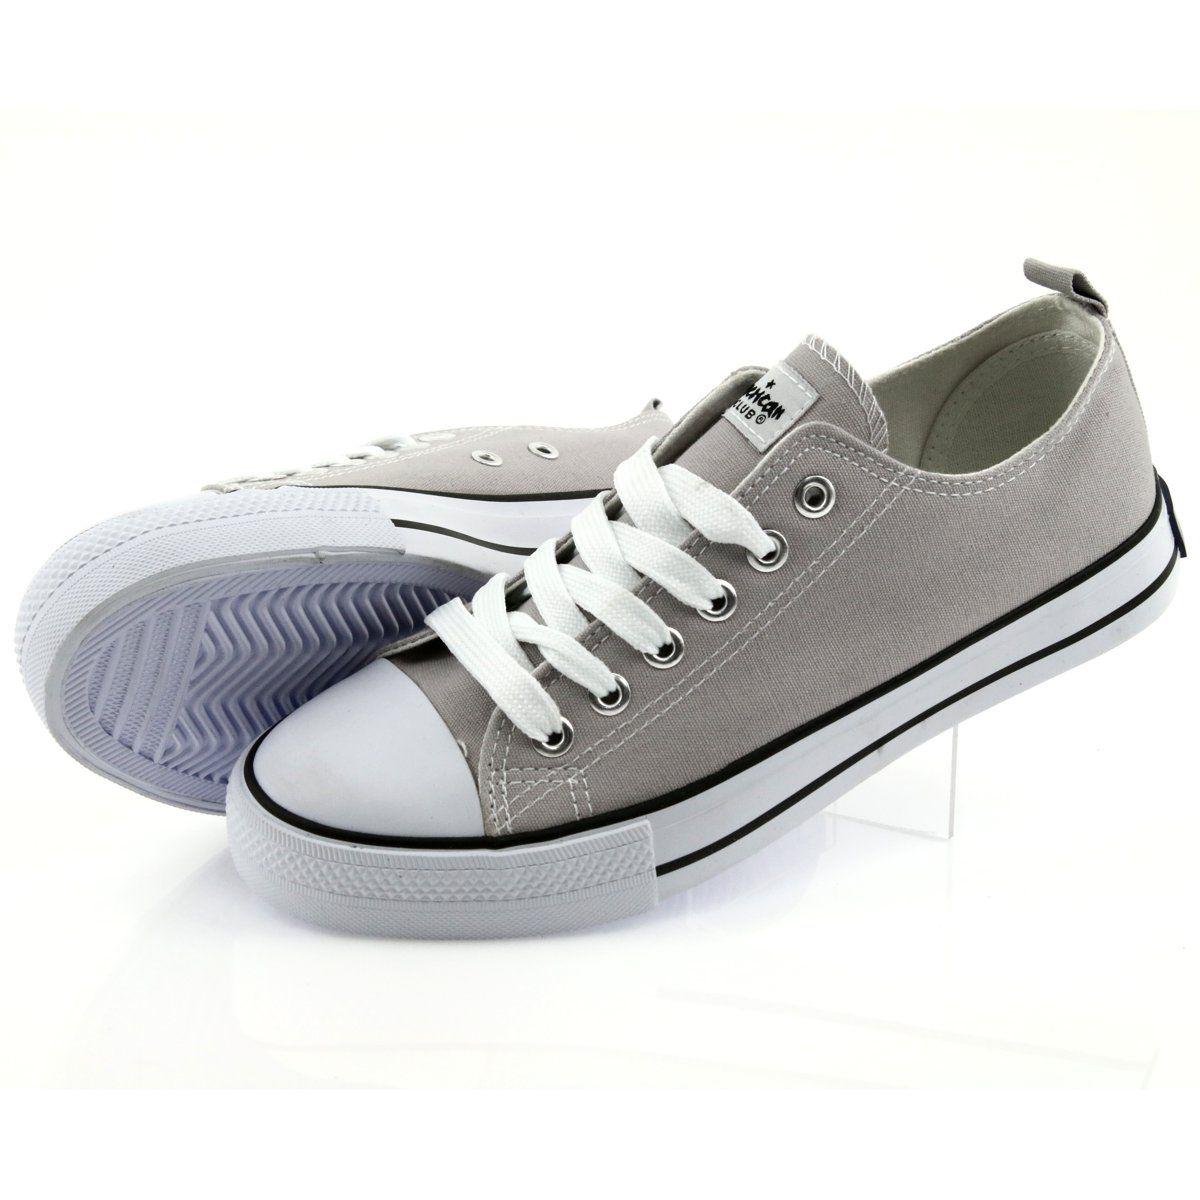 Trampki Wiazane Szare Buty Damskie American Club Sneakers Shoes Womens Sneakers